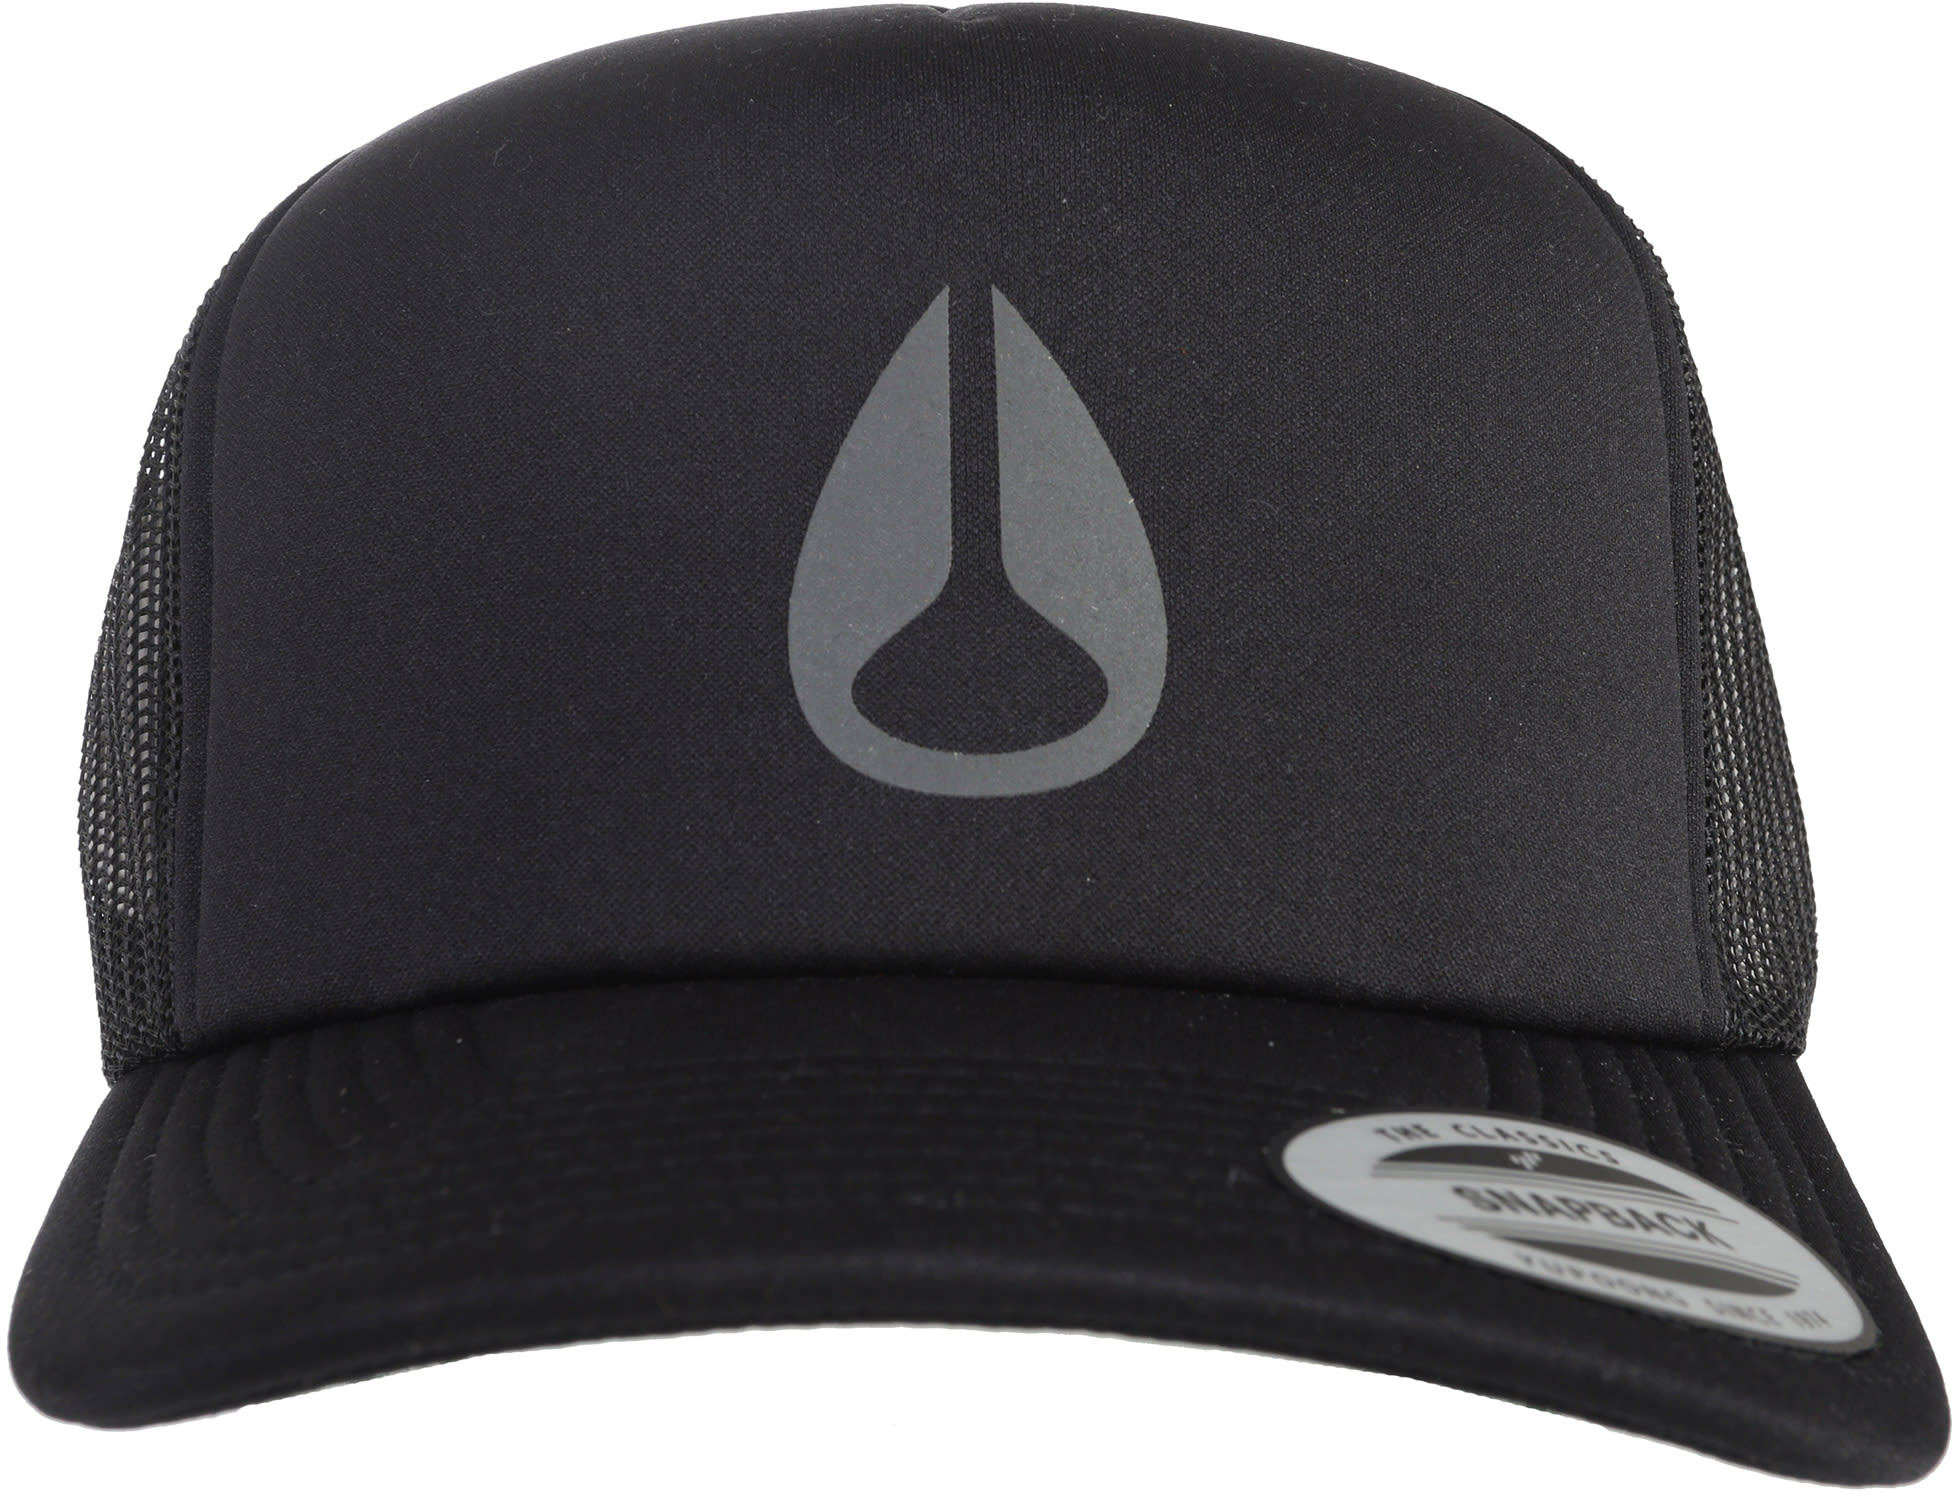 Nixon Low Trucker Cap - thumbnail 1 e85830f4282